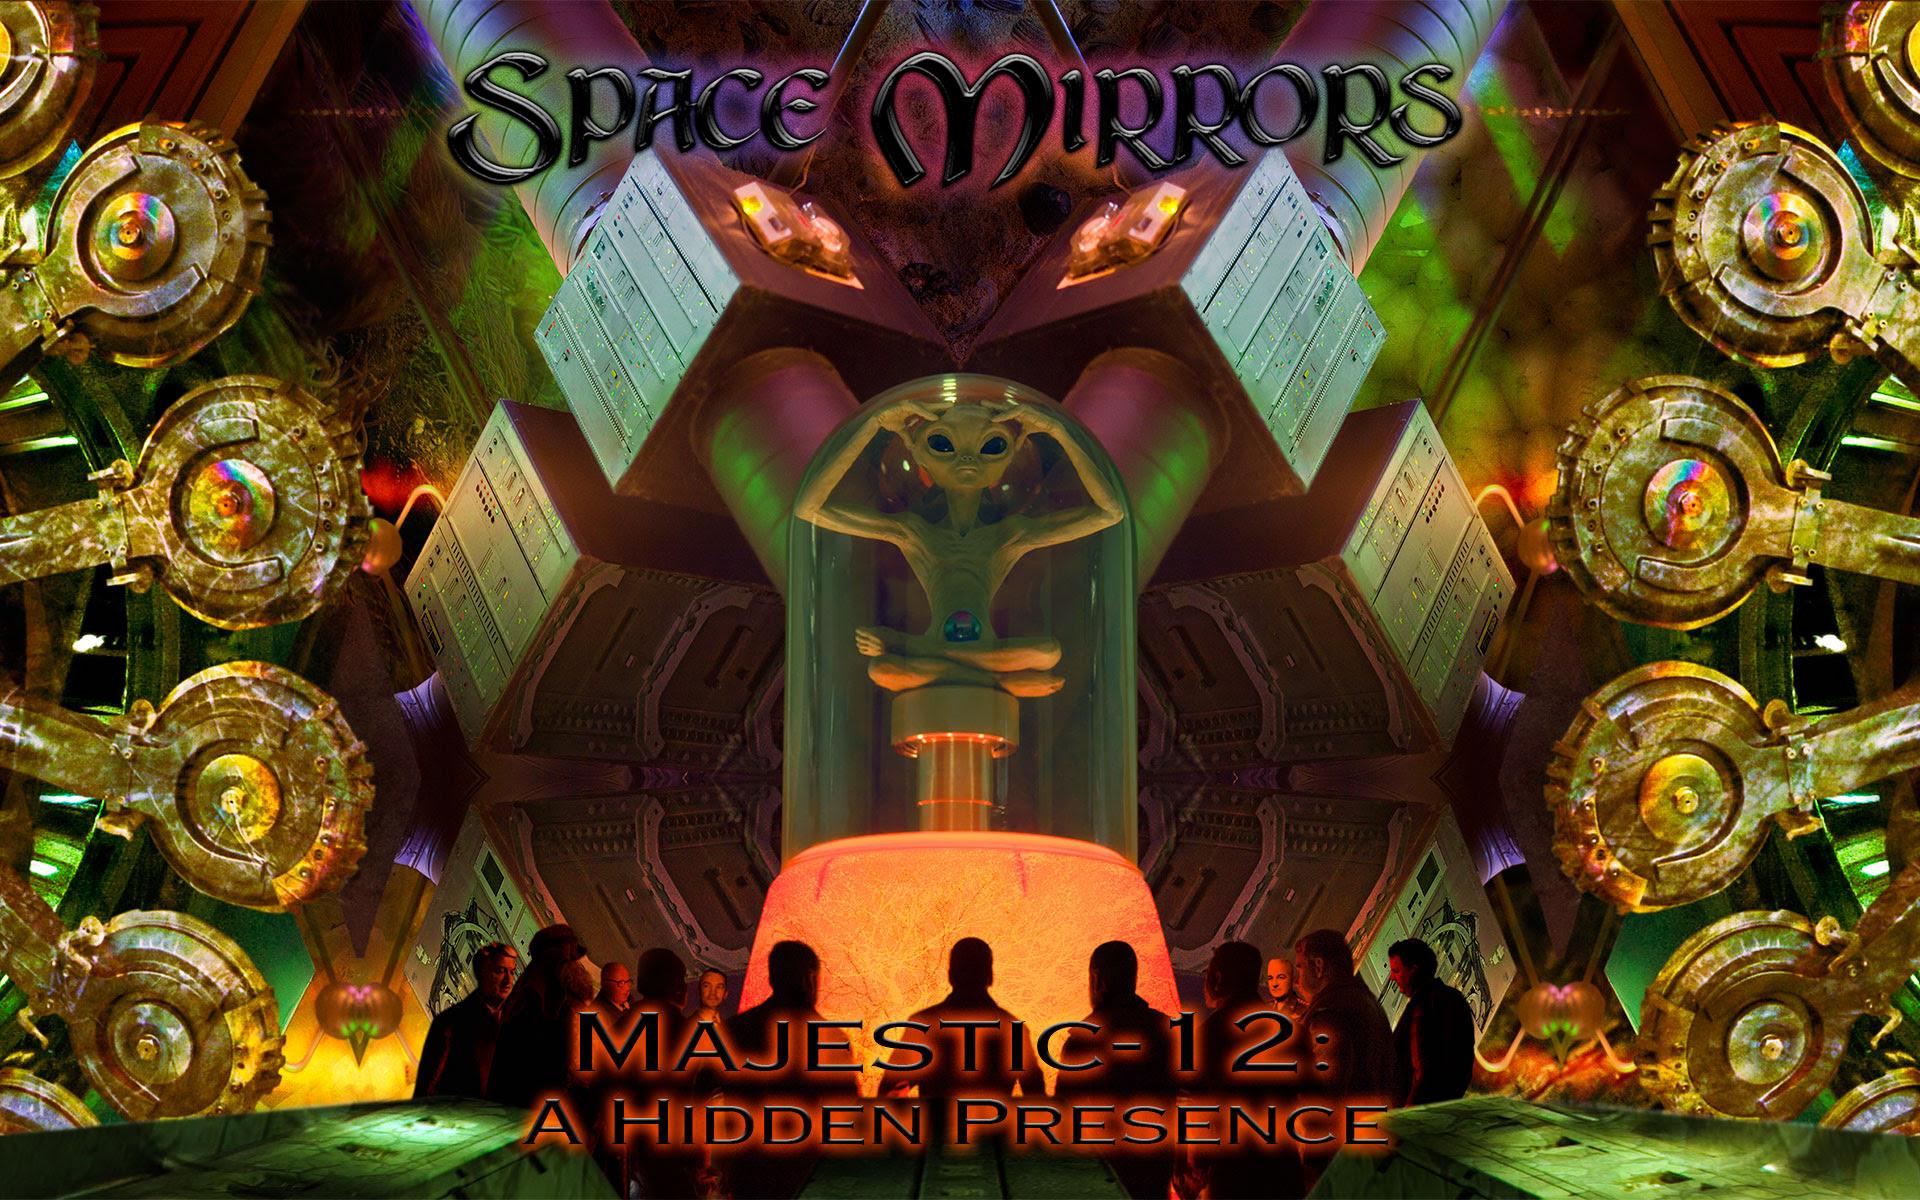 http://www.spacemirrors.com/MJ-12-Wallpaper_1920x1200.jpg